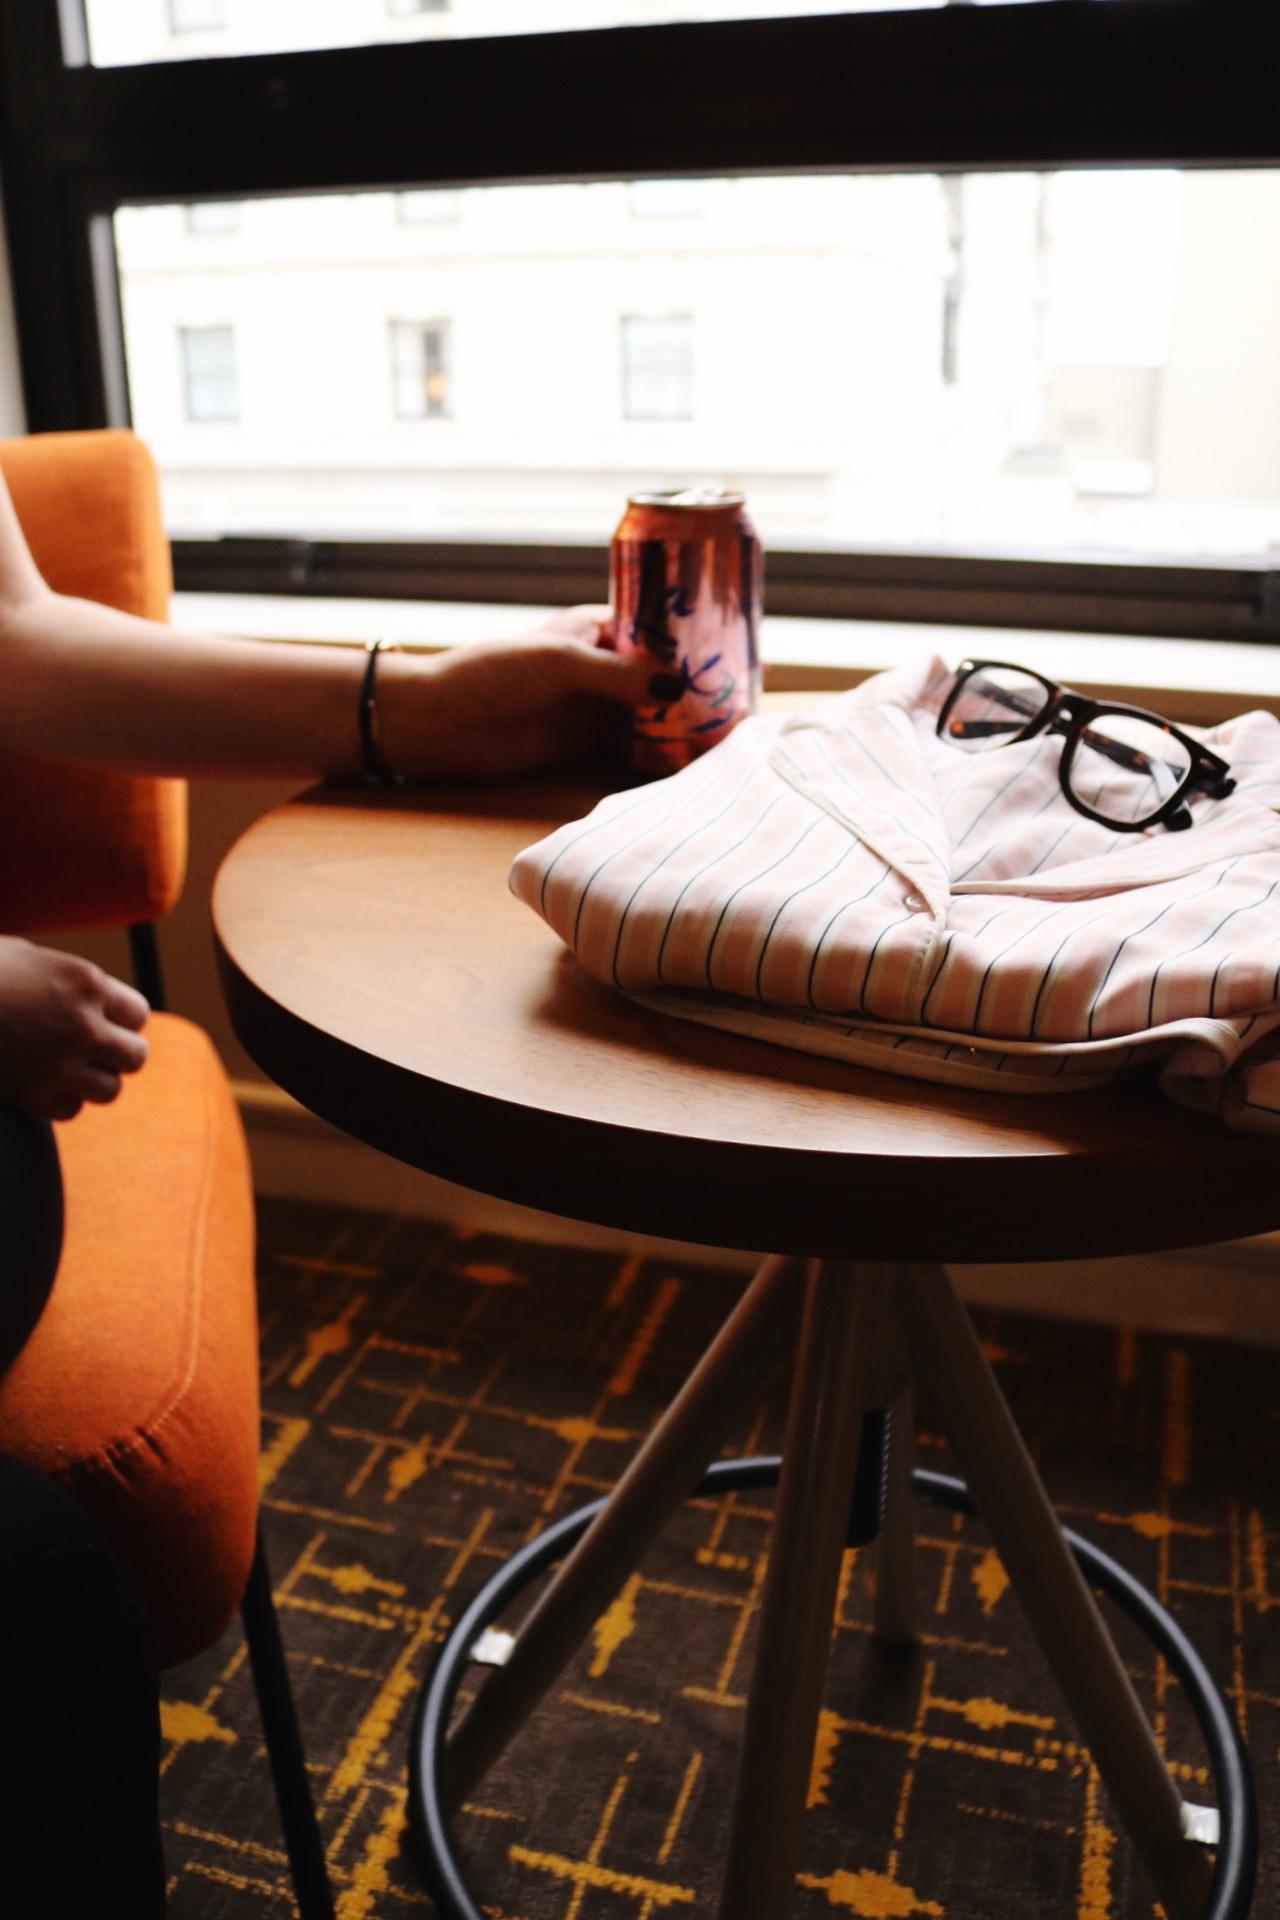 Striped pink pajama set, black rim glasses, La Croix, San Fransisco getaway